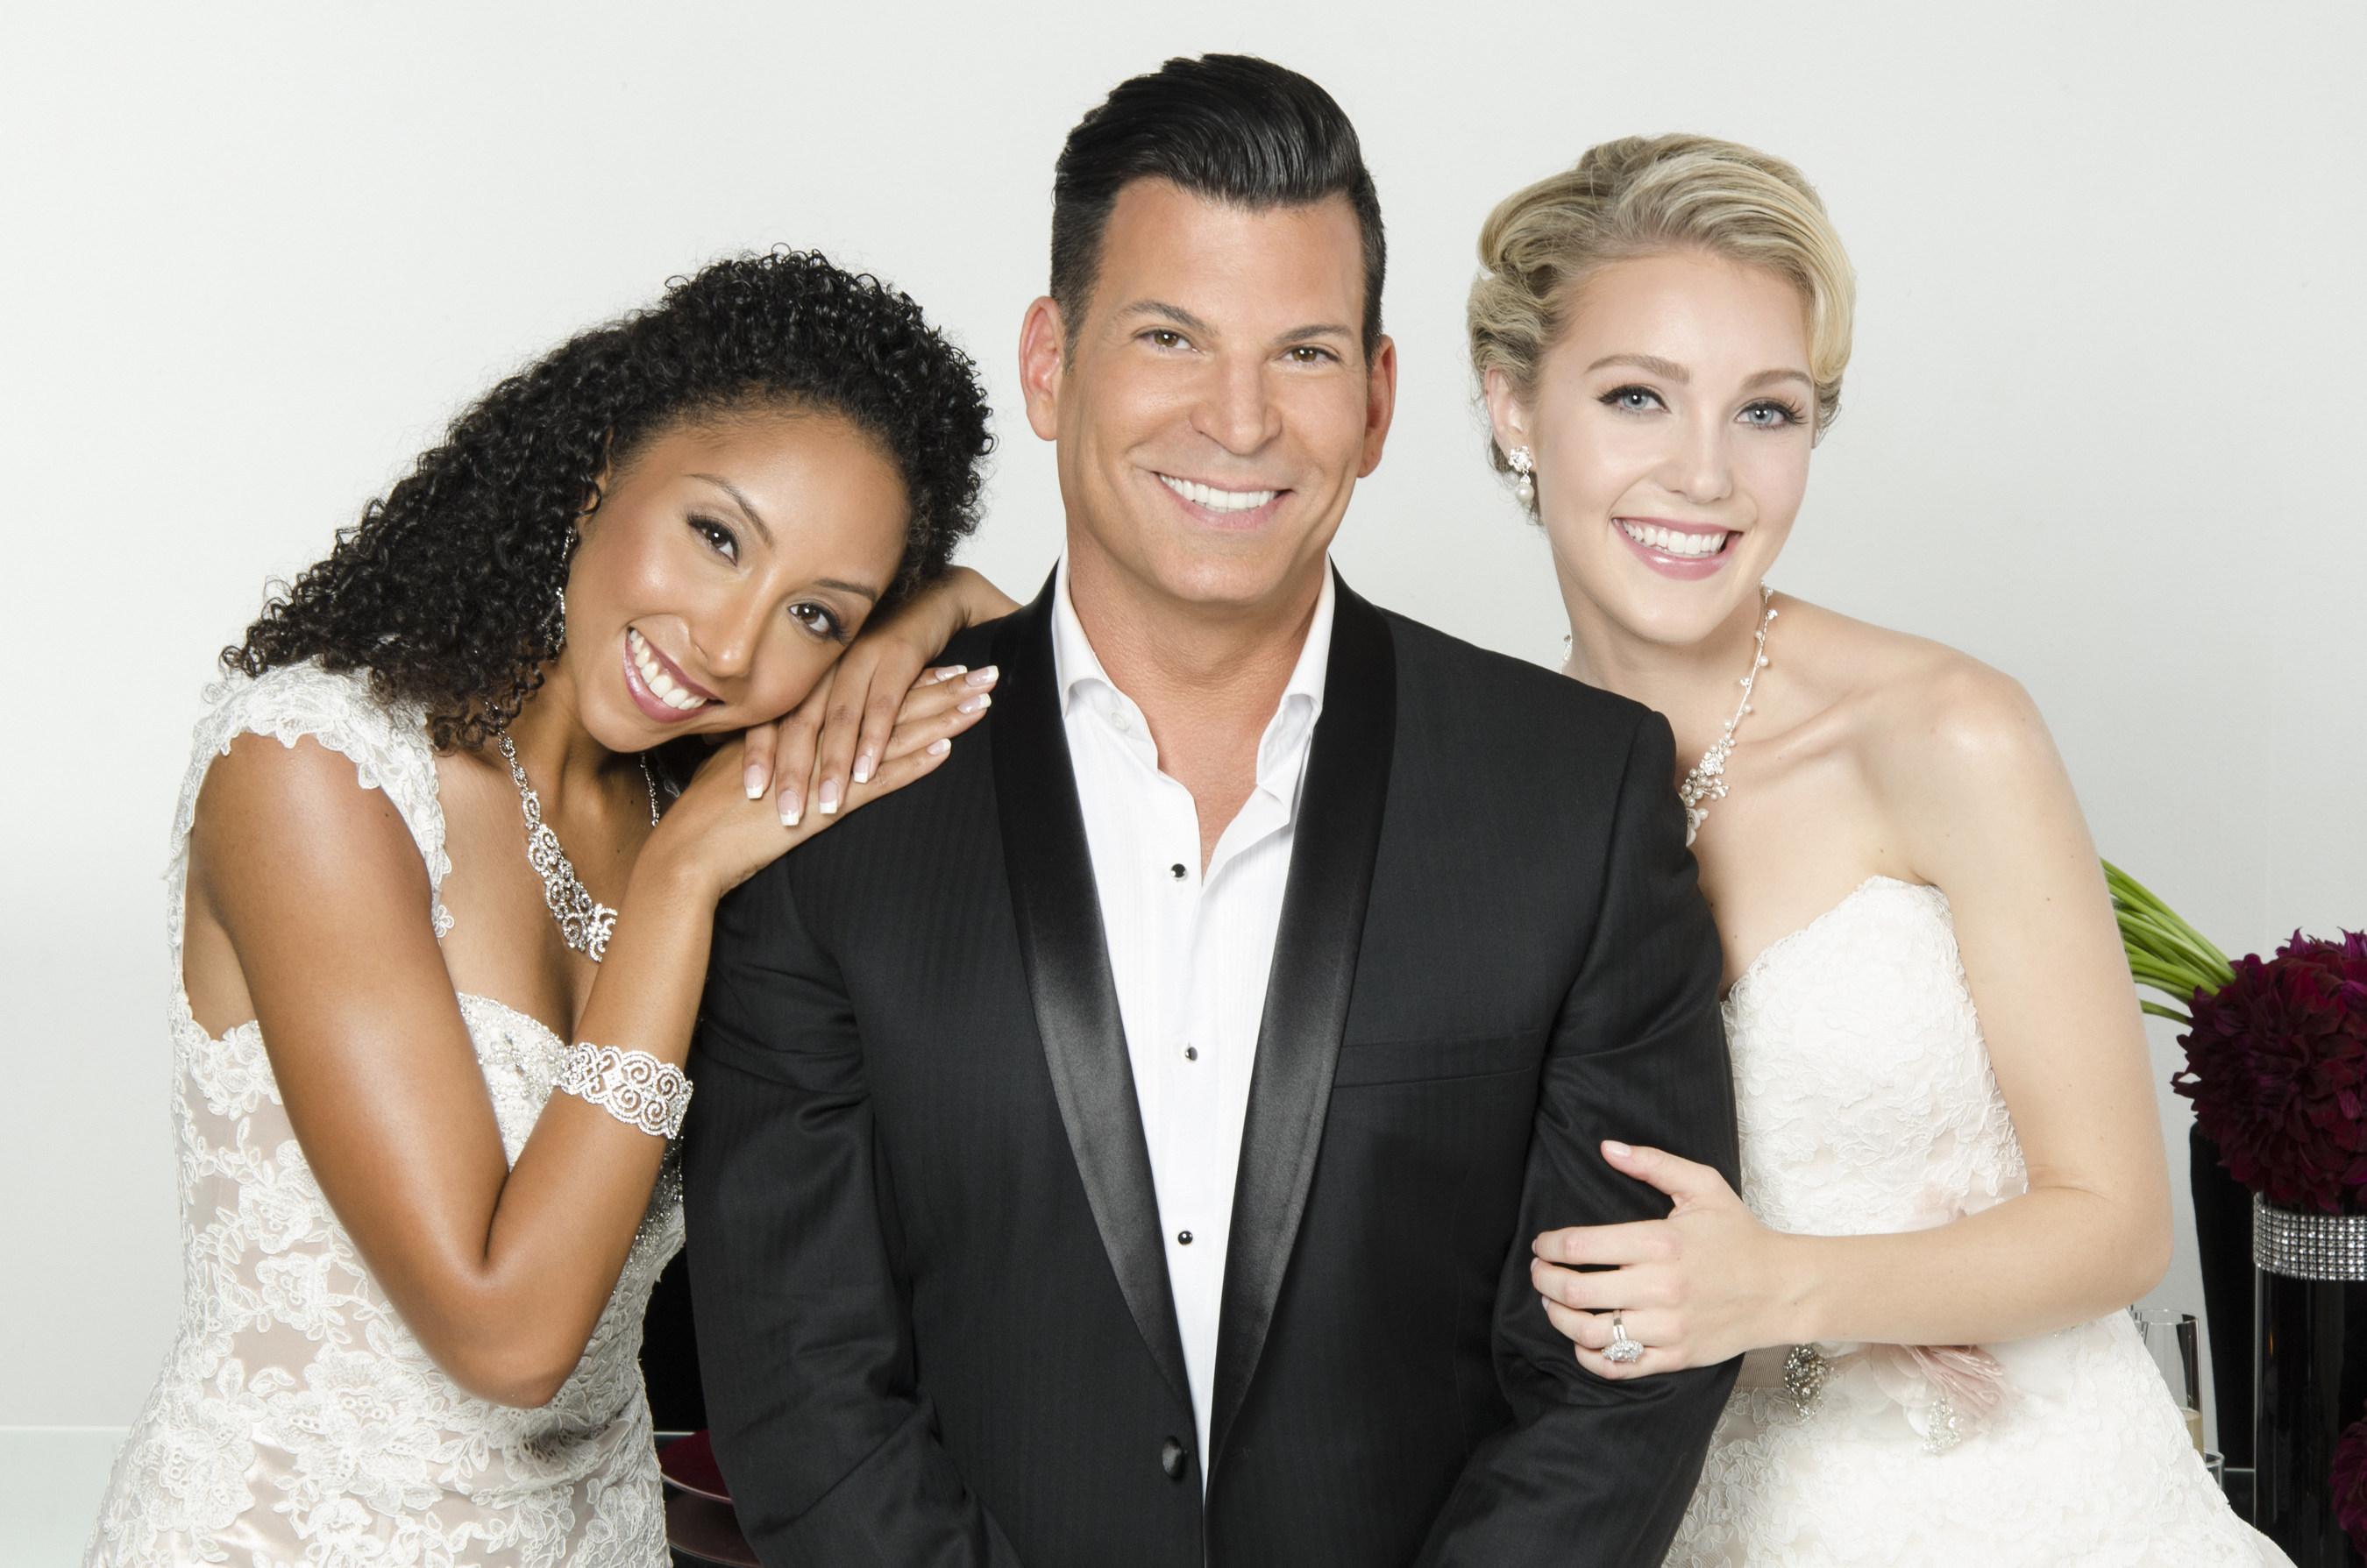 Celebrity Wedding Planner Tv Host David Tutera Announces Your Experience Multi